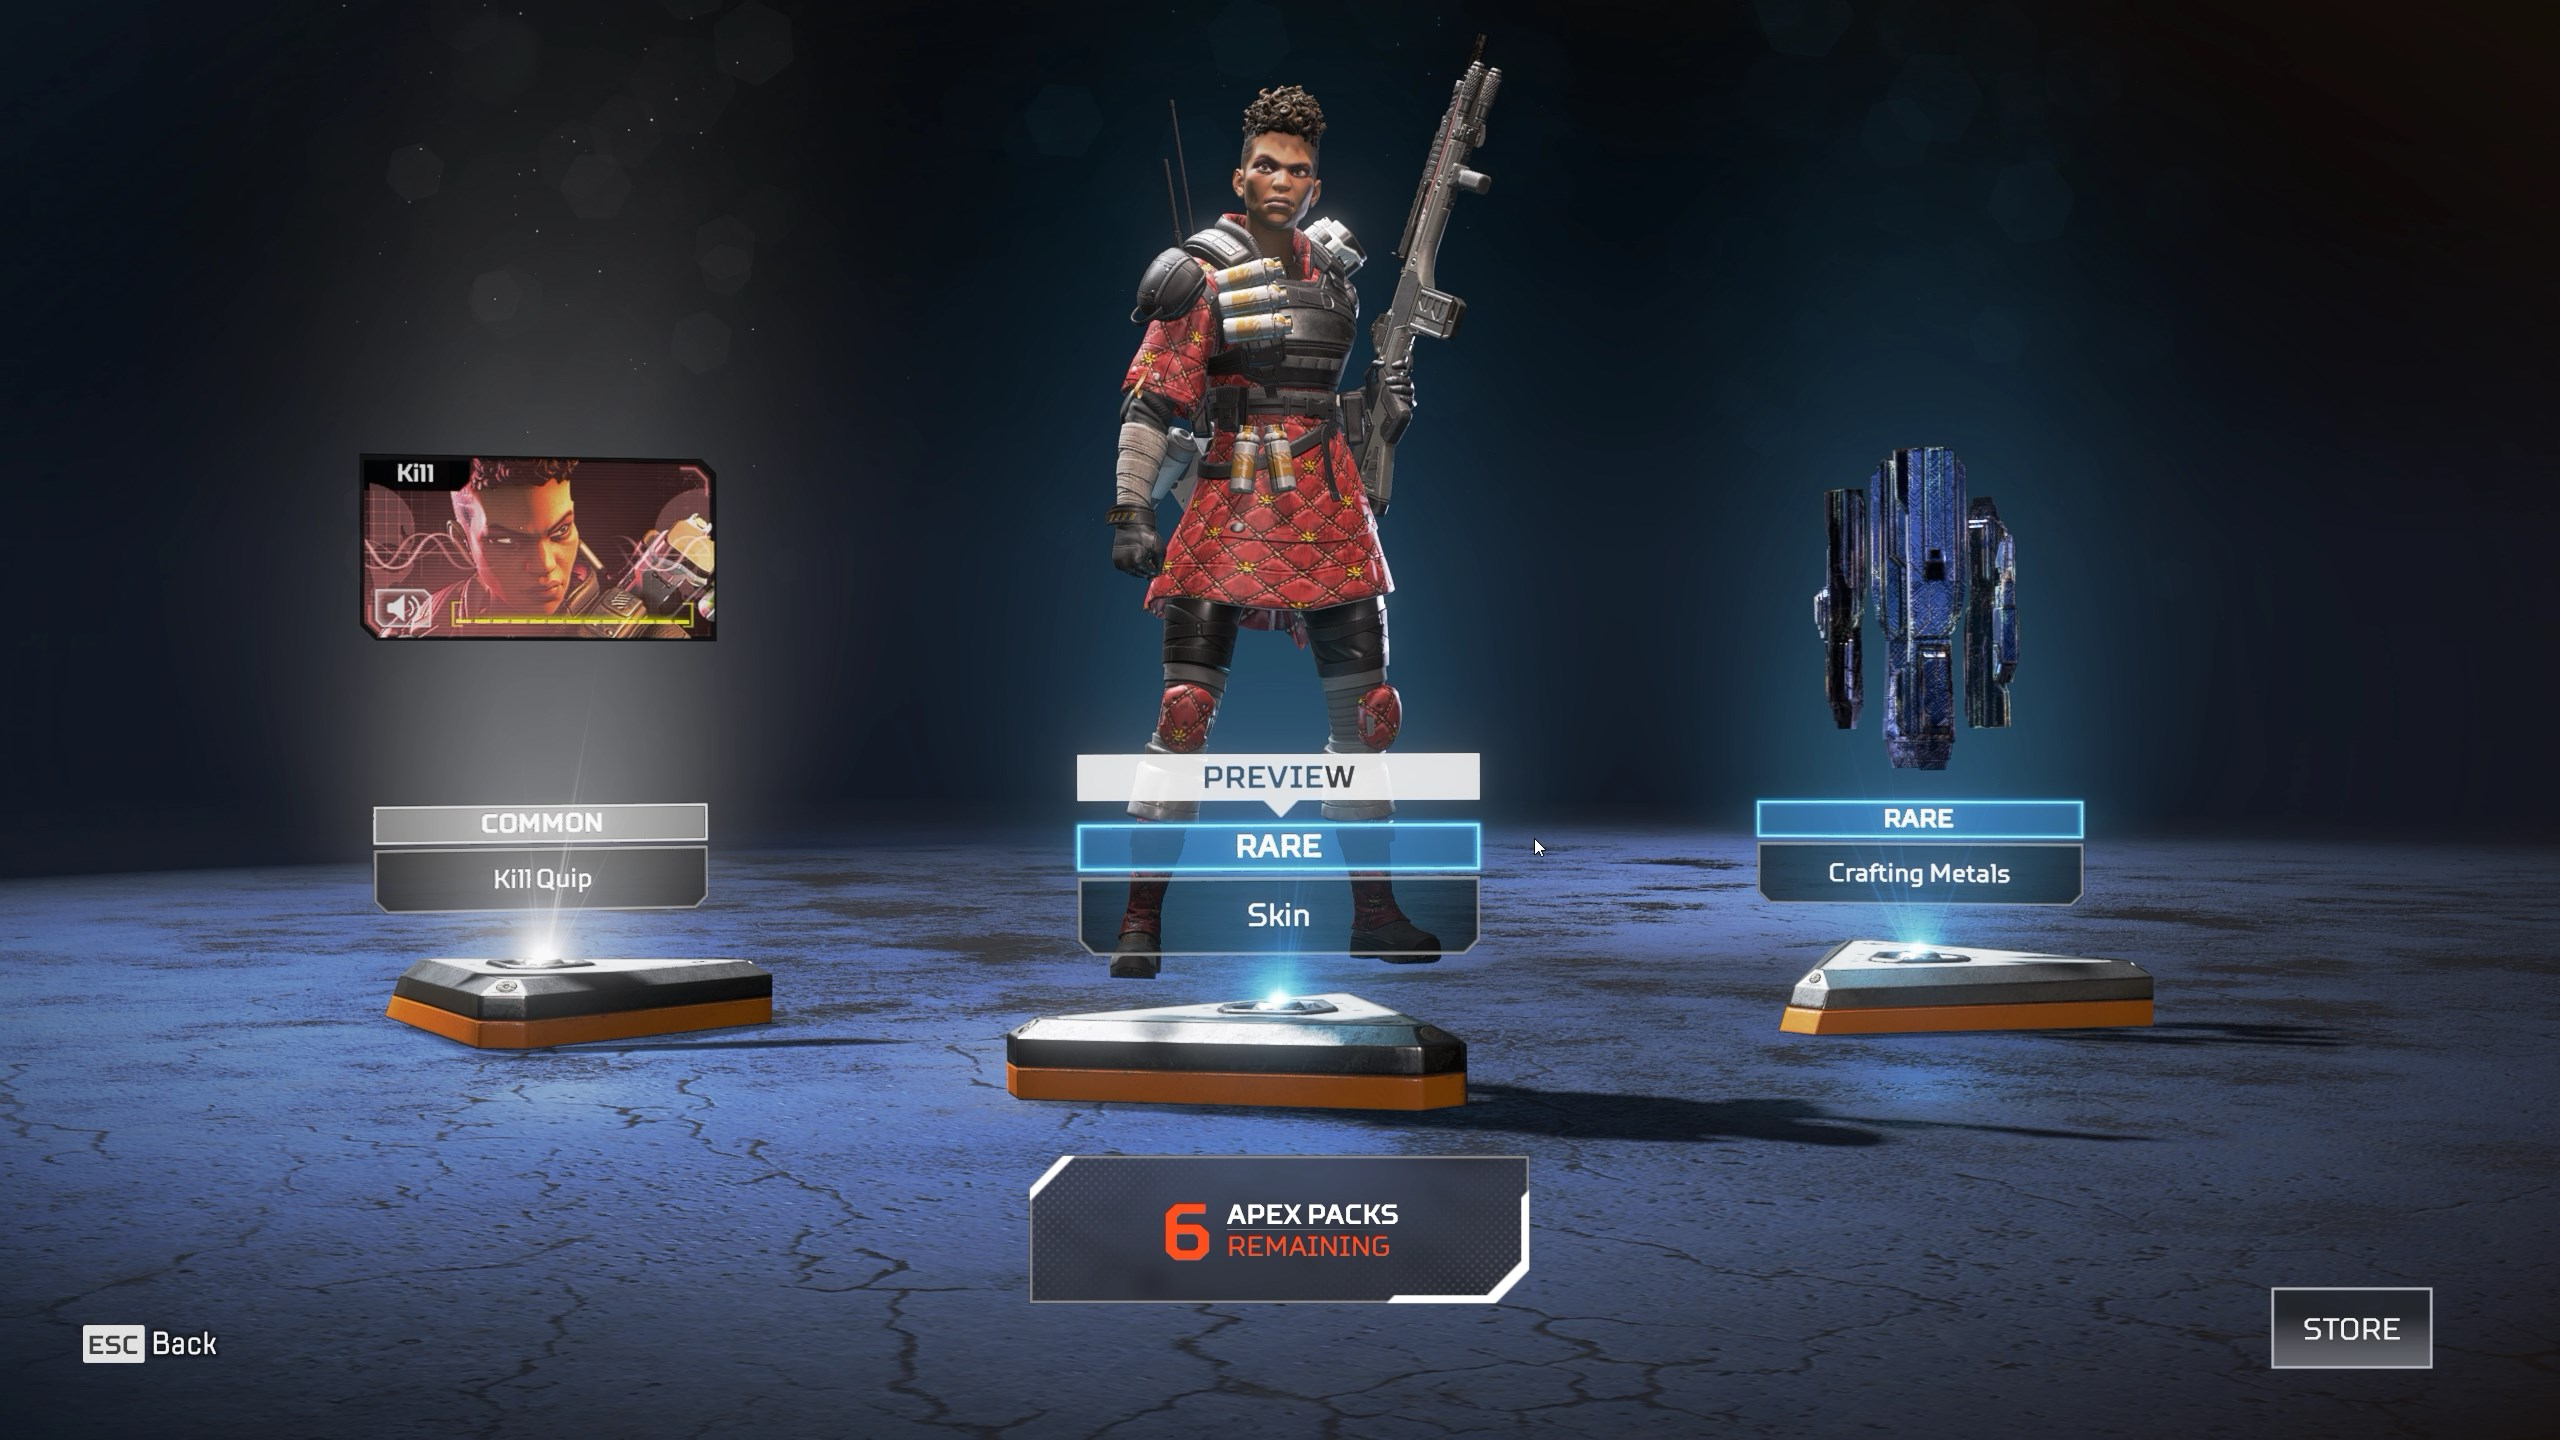 Apex Legends Loot